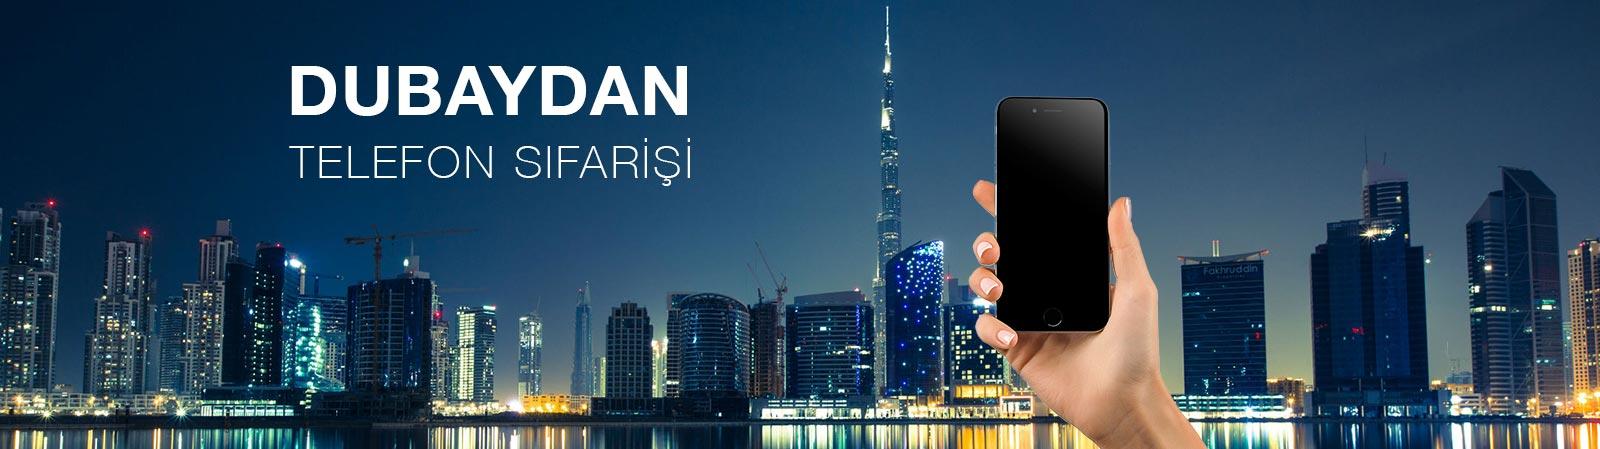 dubaydan-telefon-sifarisi